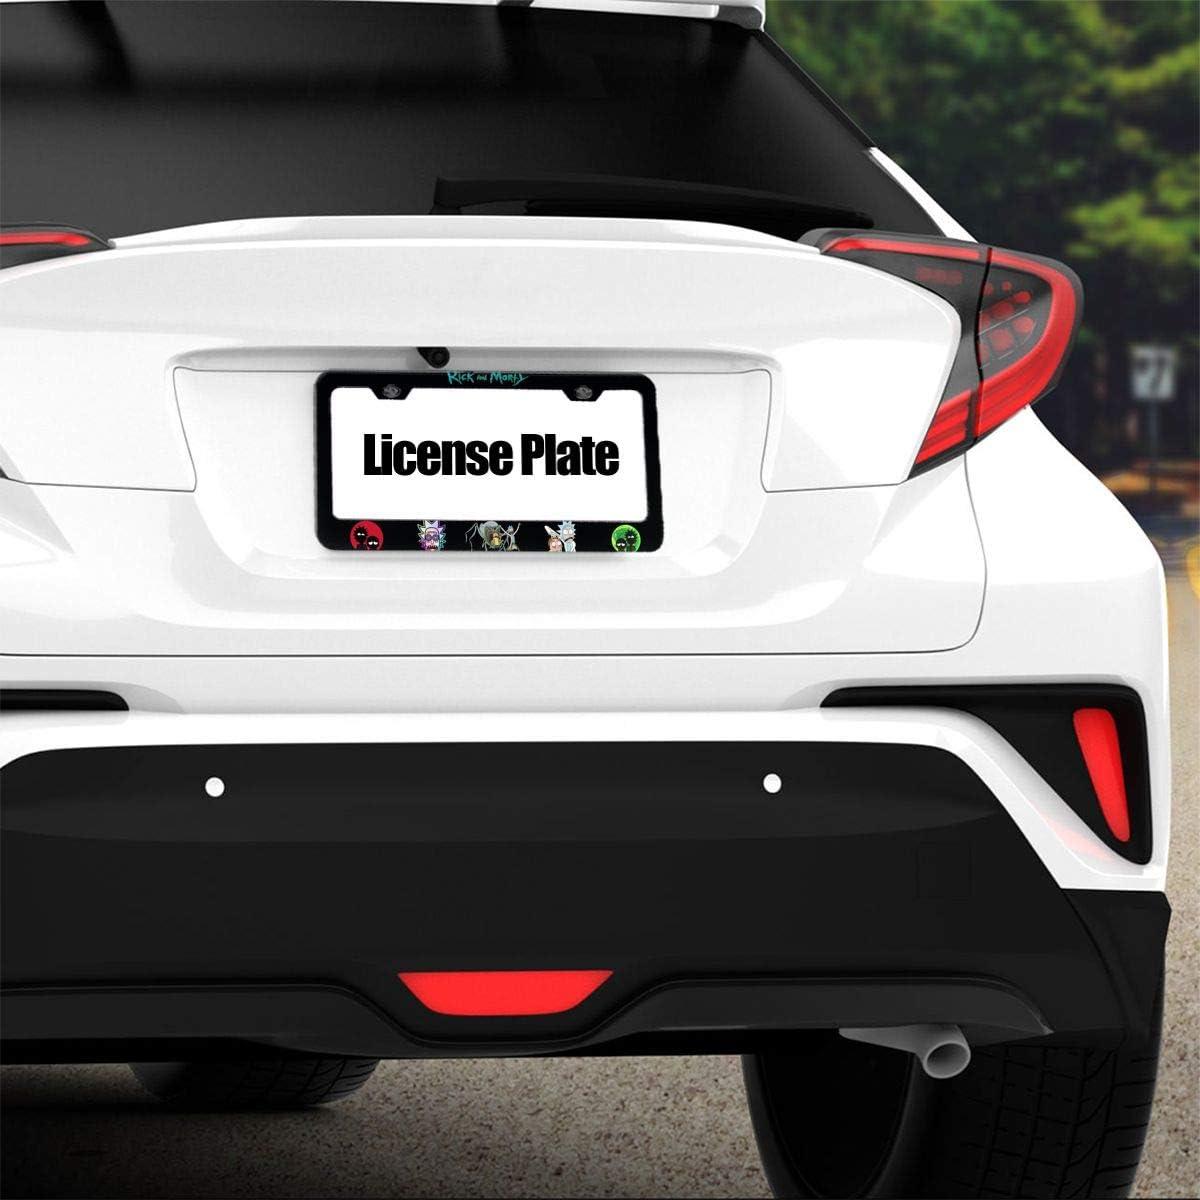 D0zopazkw License Plate Car Frame Collage License Plate Frame Aluminum Rick N Morty